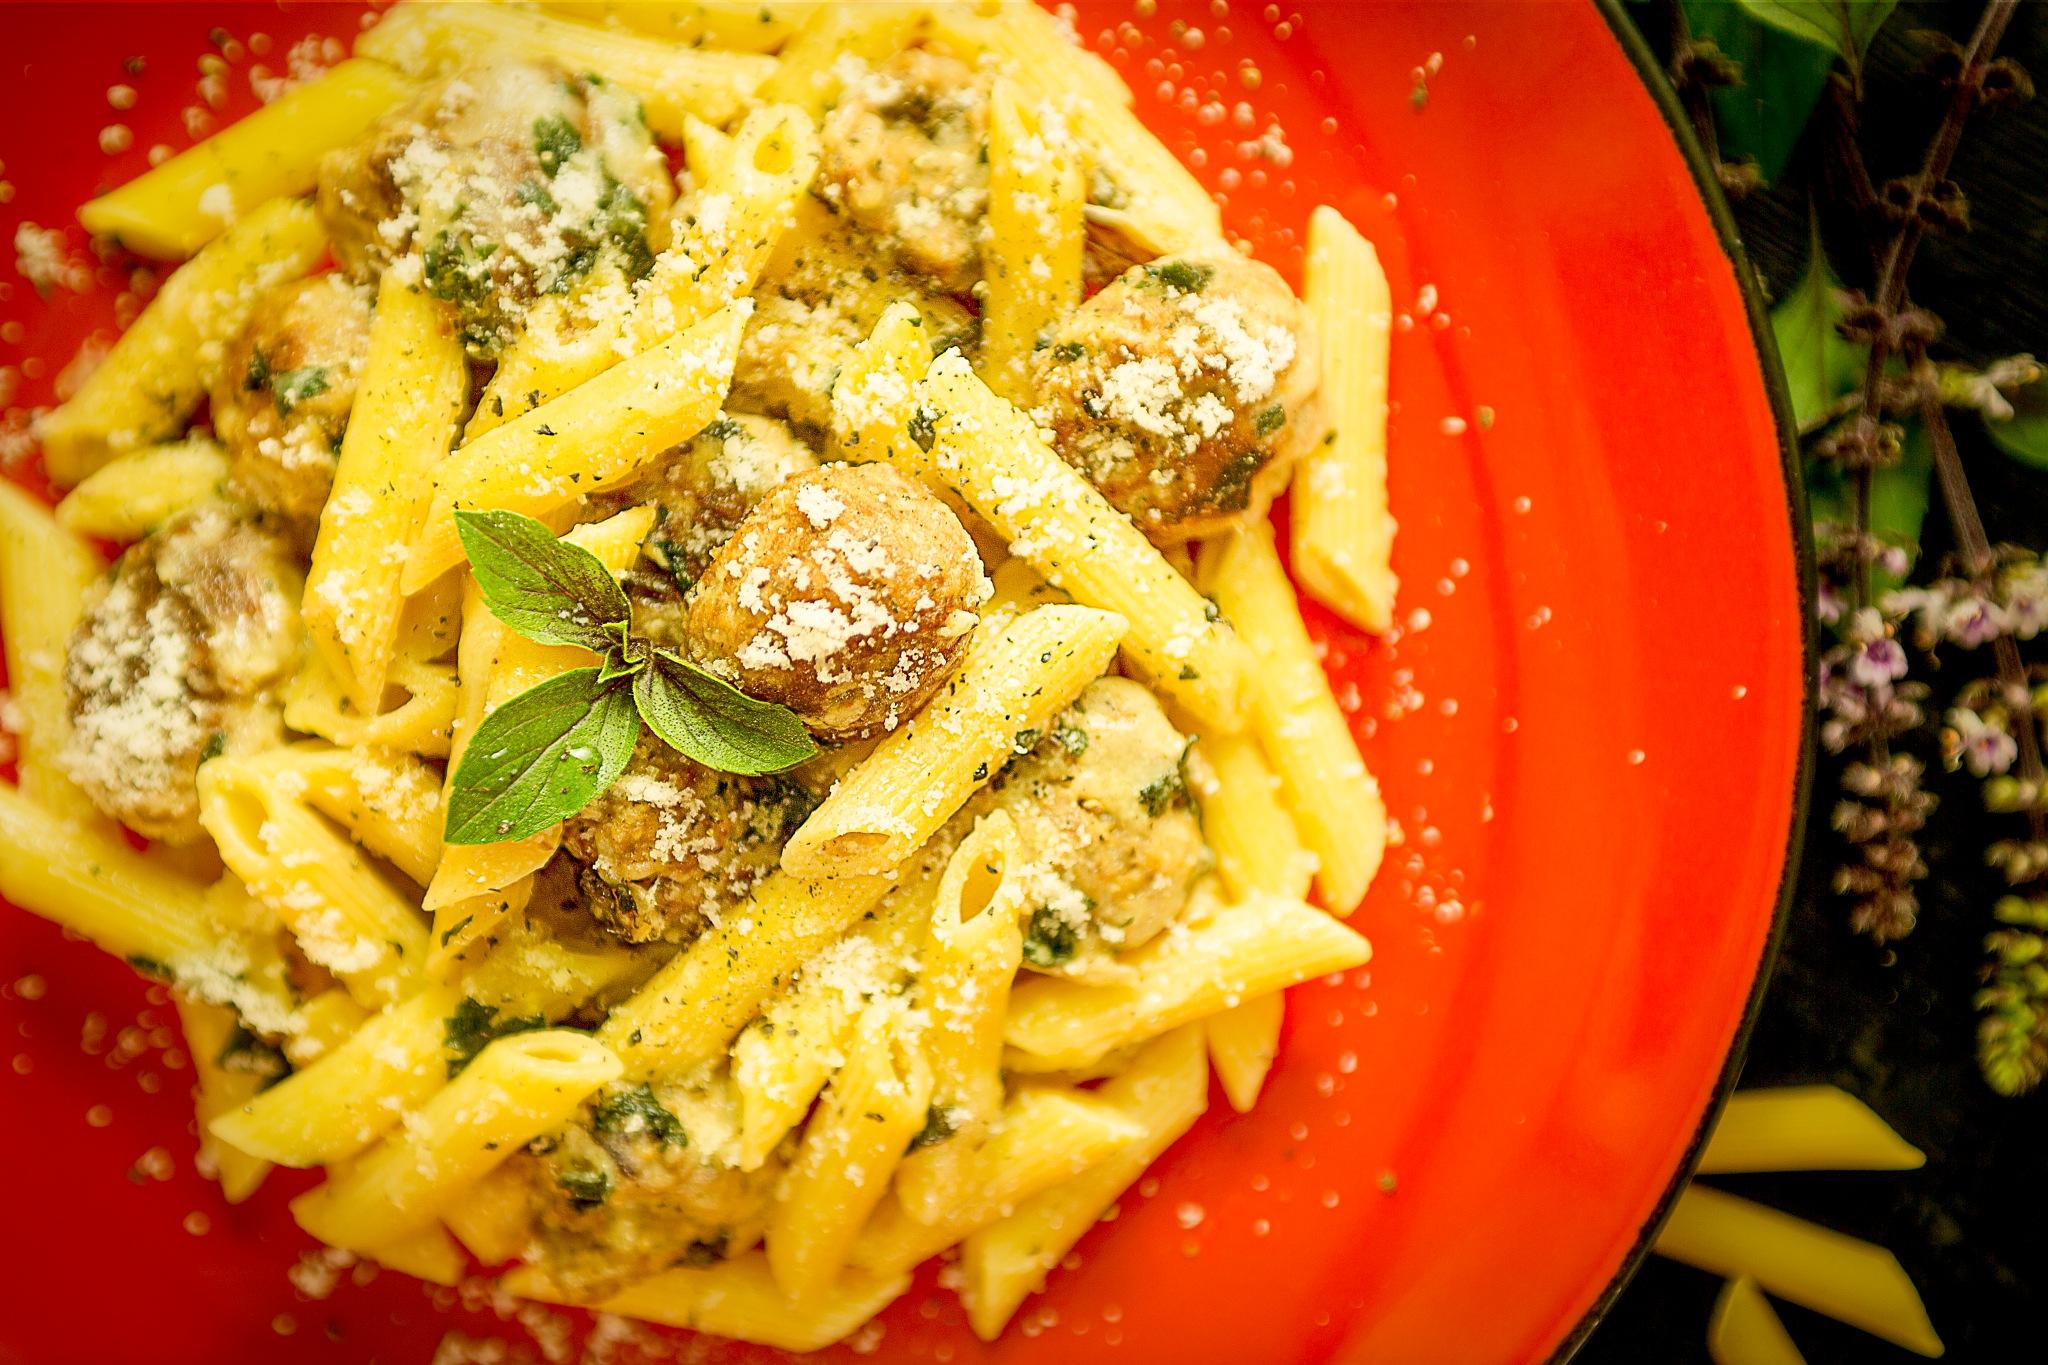 Homemade meatball pasta by Giuseppe Calvinisti